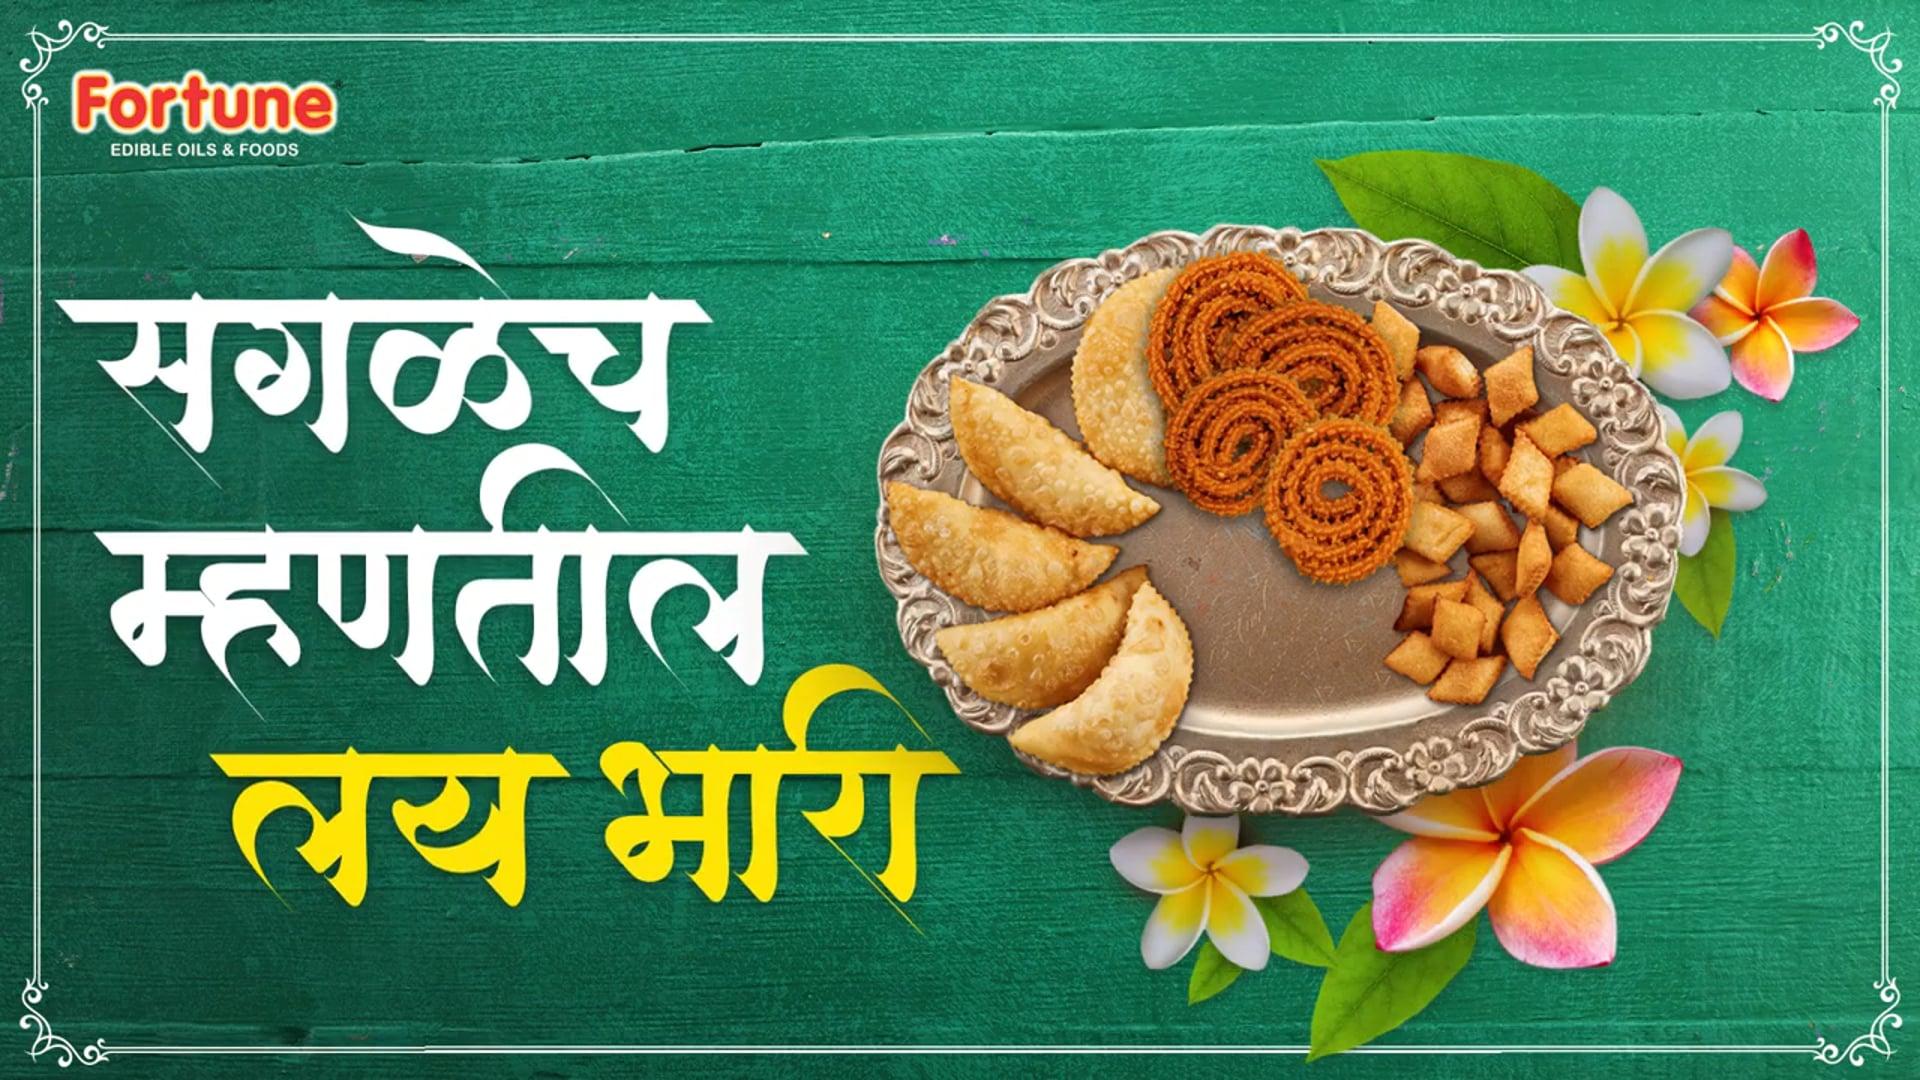 Ganesh Chaturthi special Chakli & Shankarpali Fortune Foods